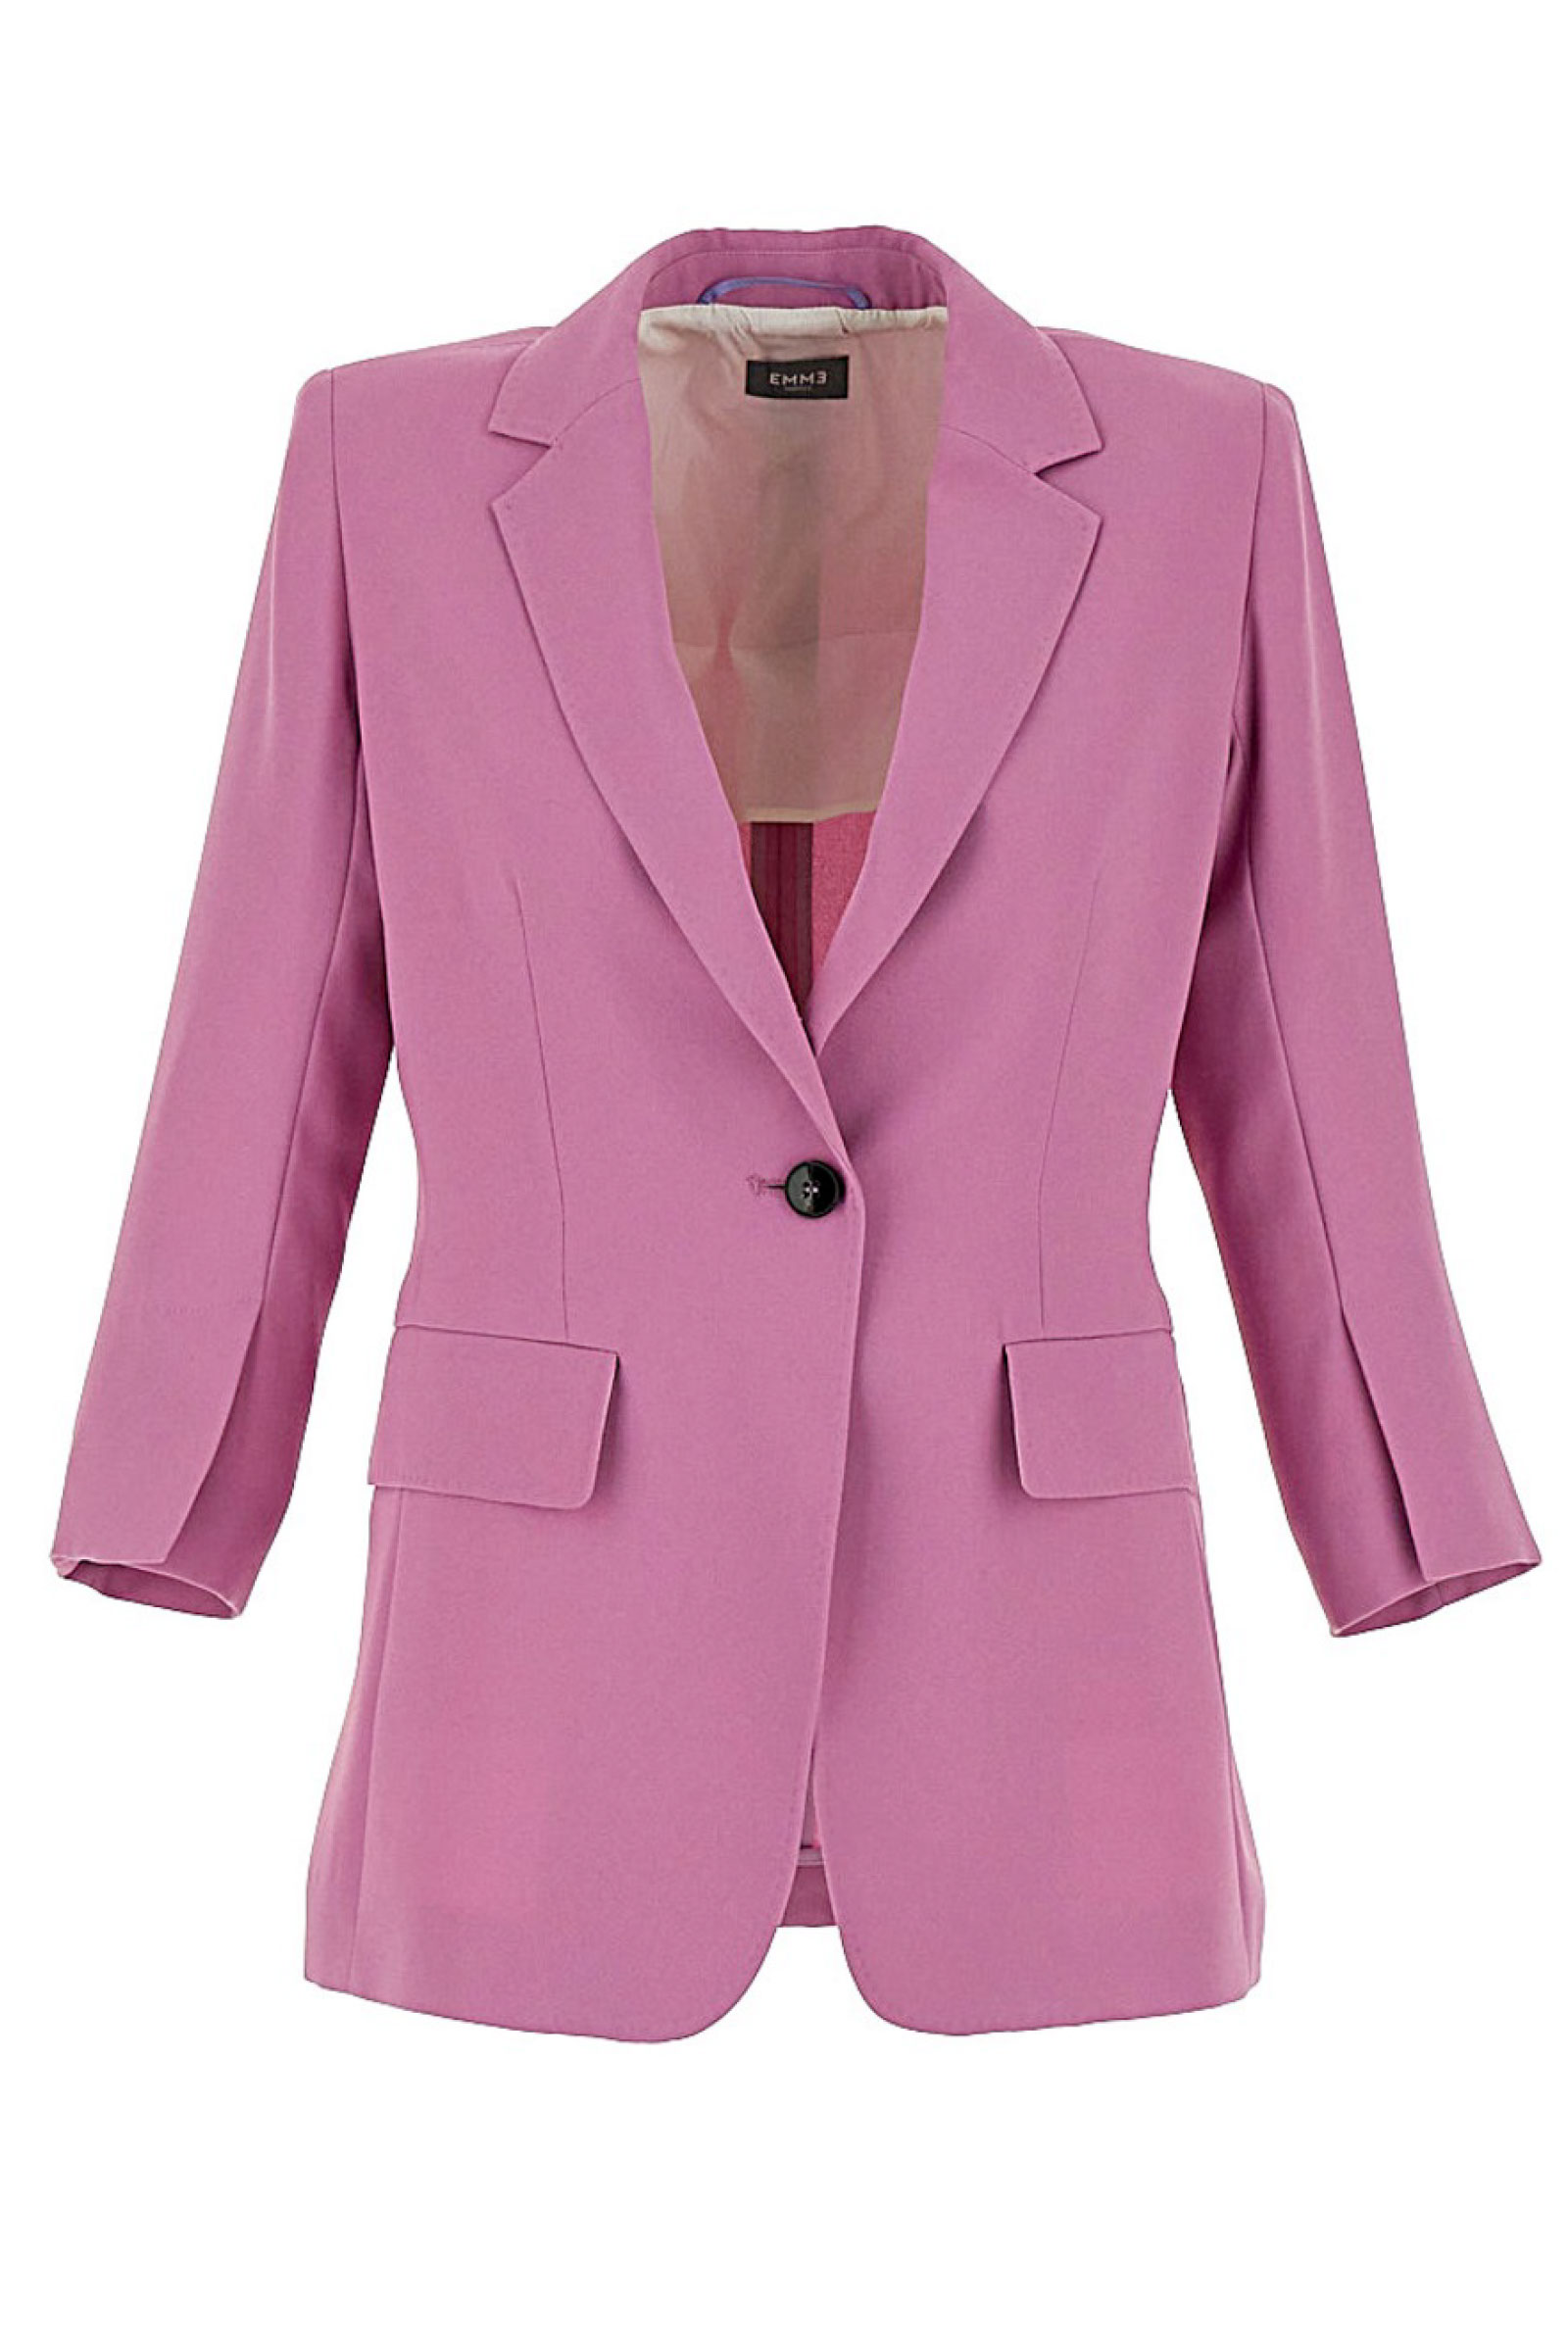 EMME MARELLA | Jacket | 50411915000004